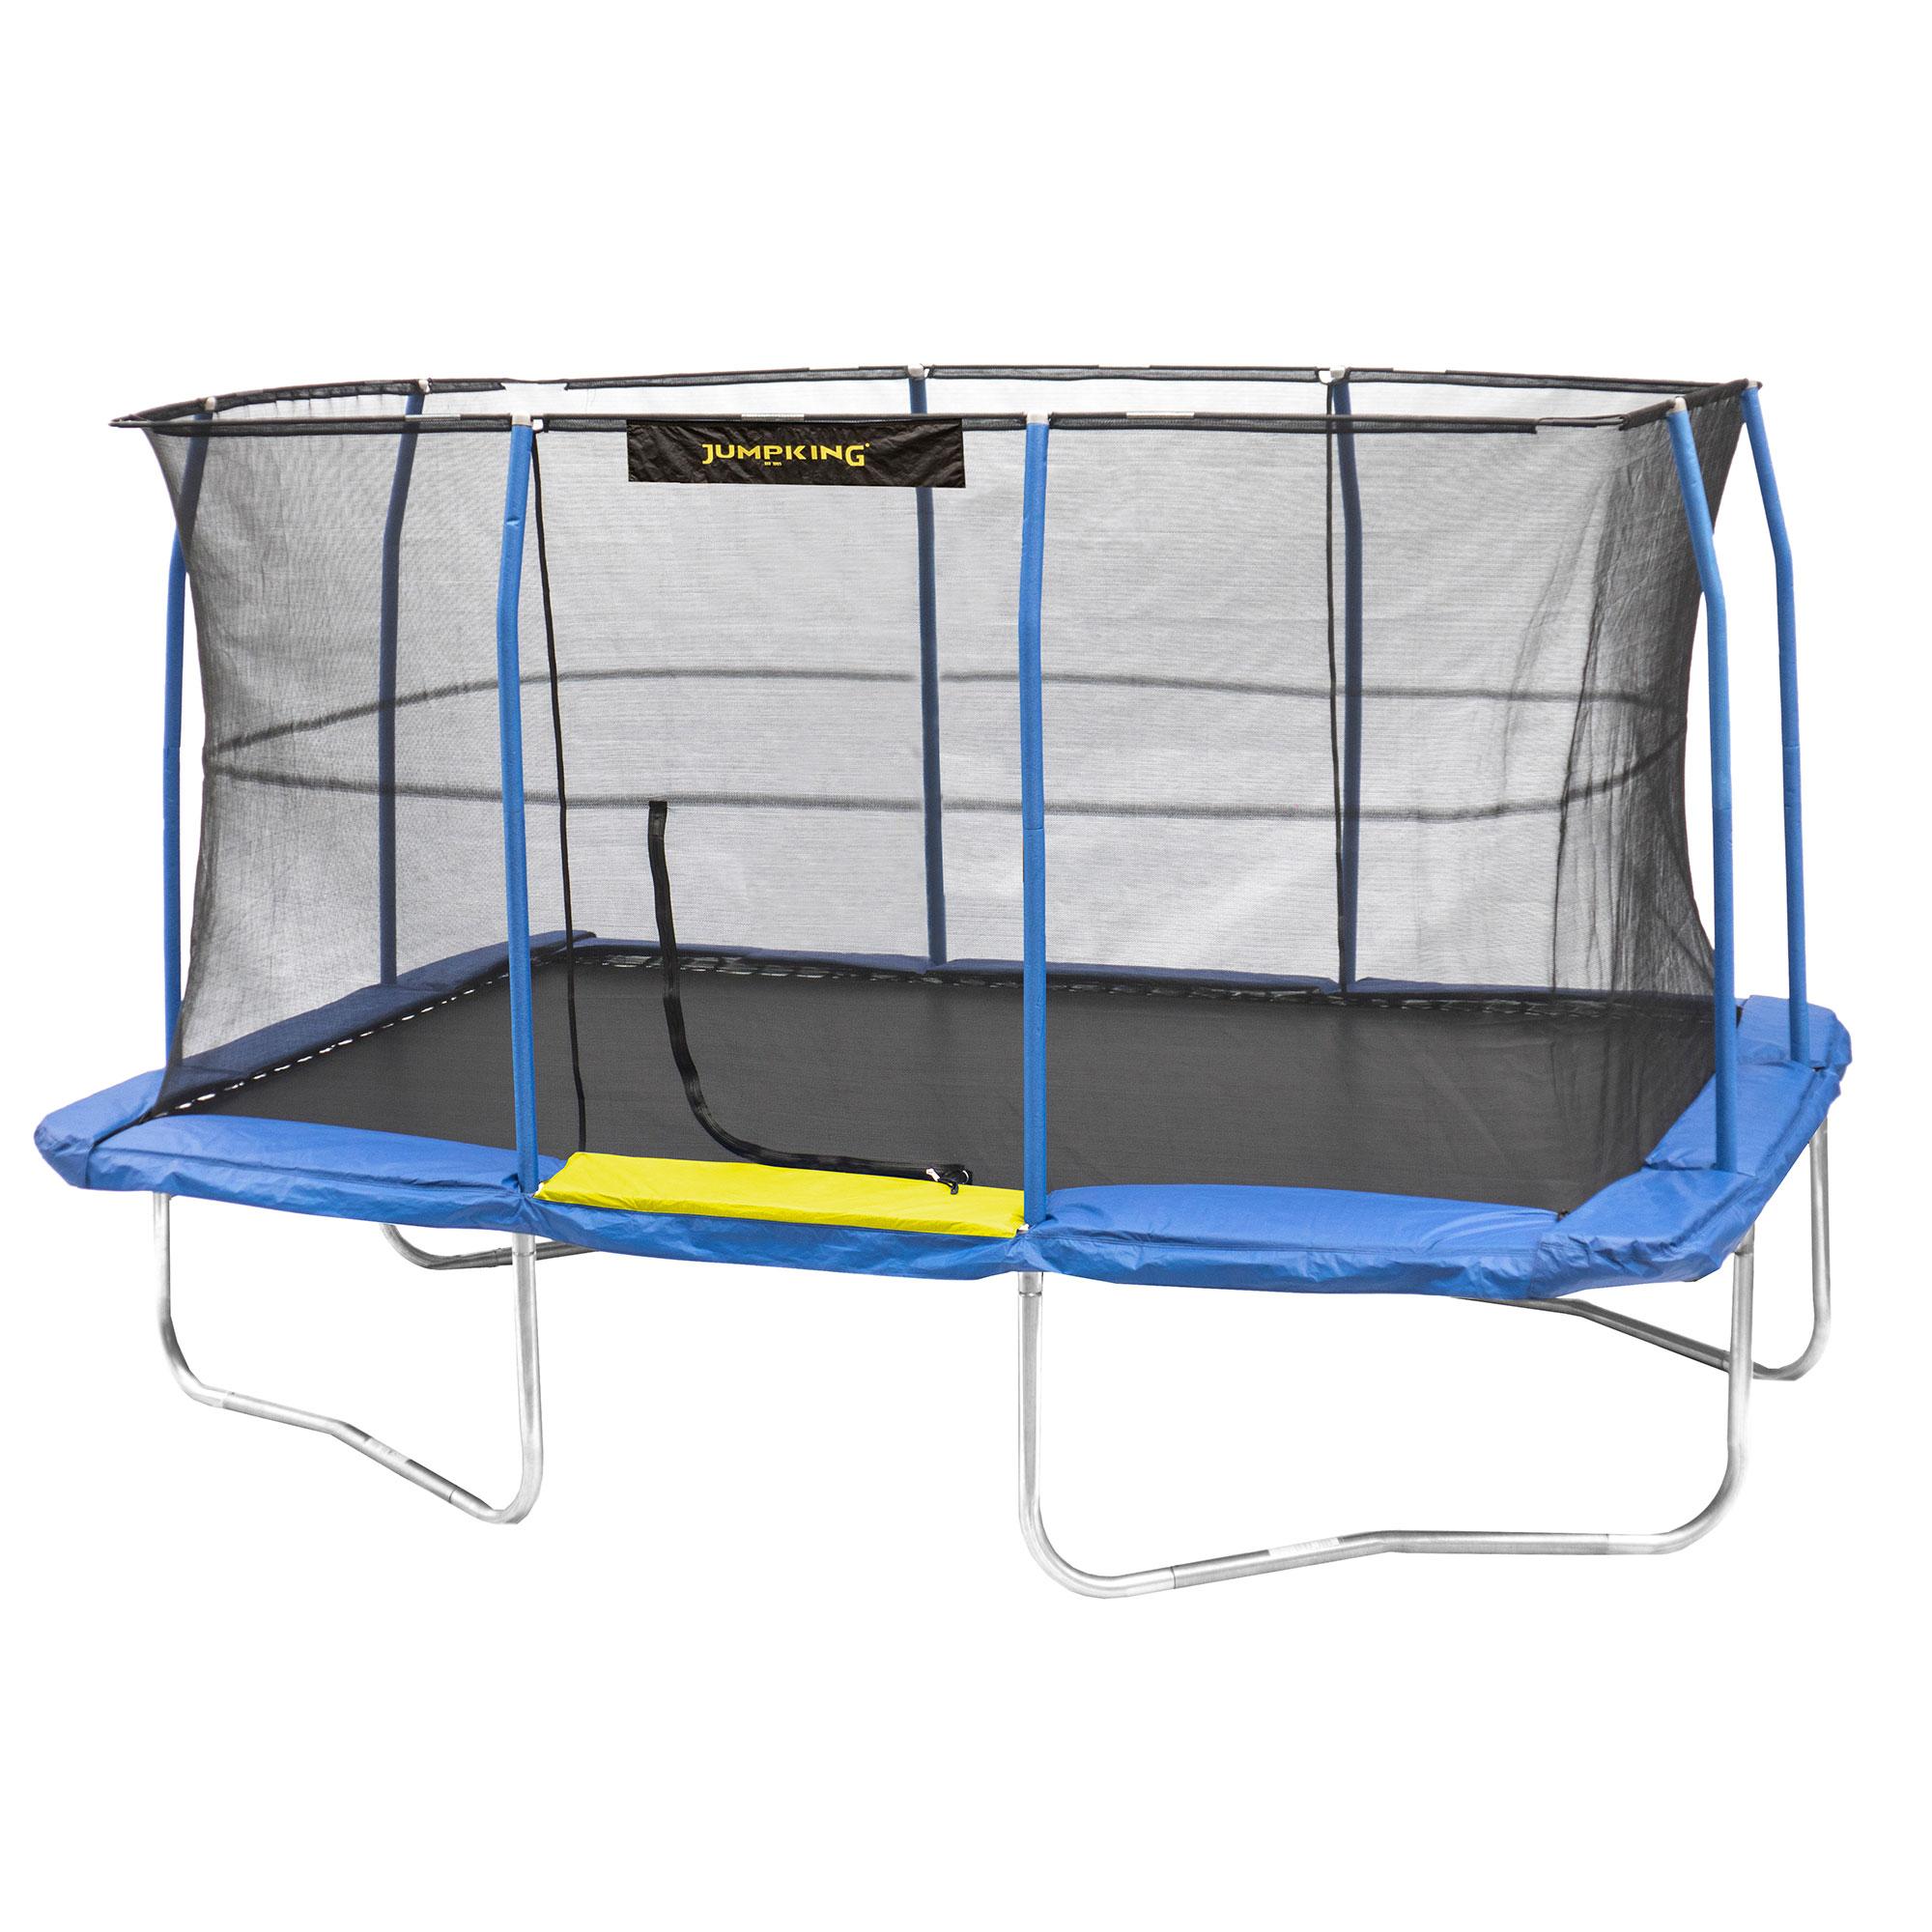 10 x 14 foot enclosed rectangular trampoline